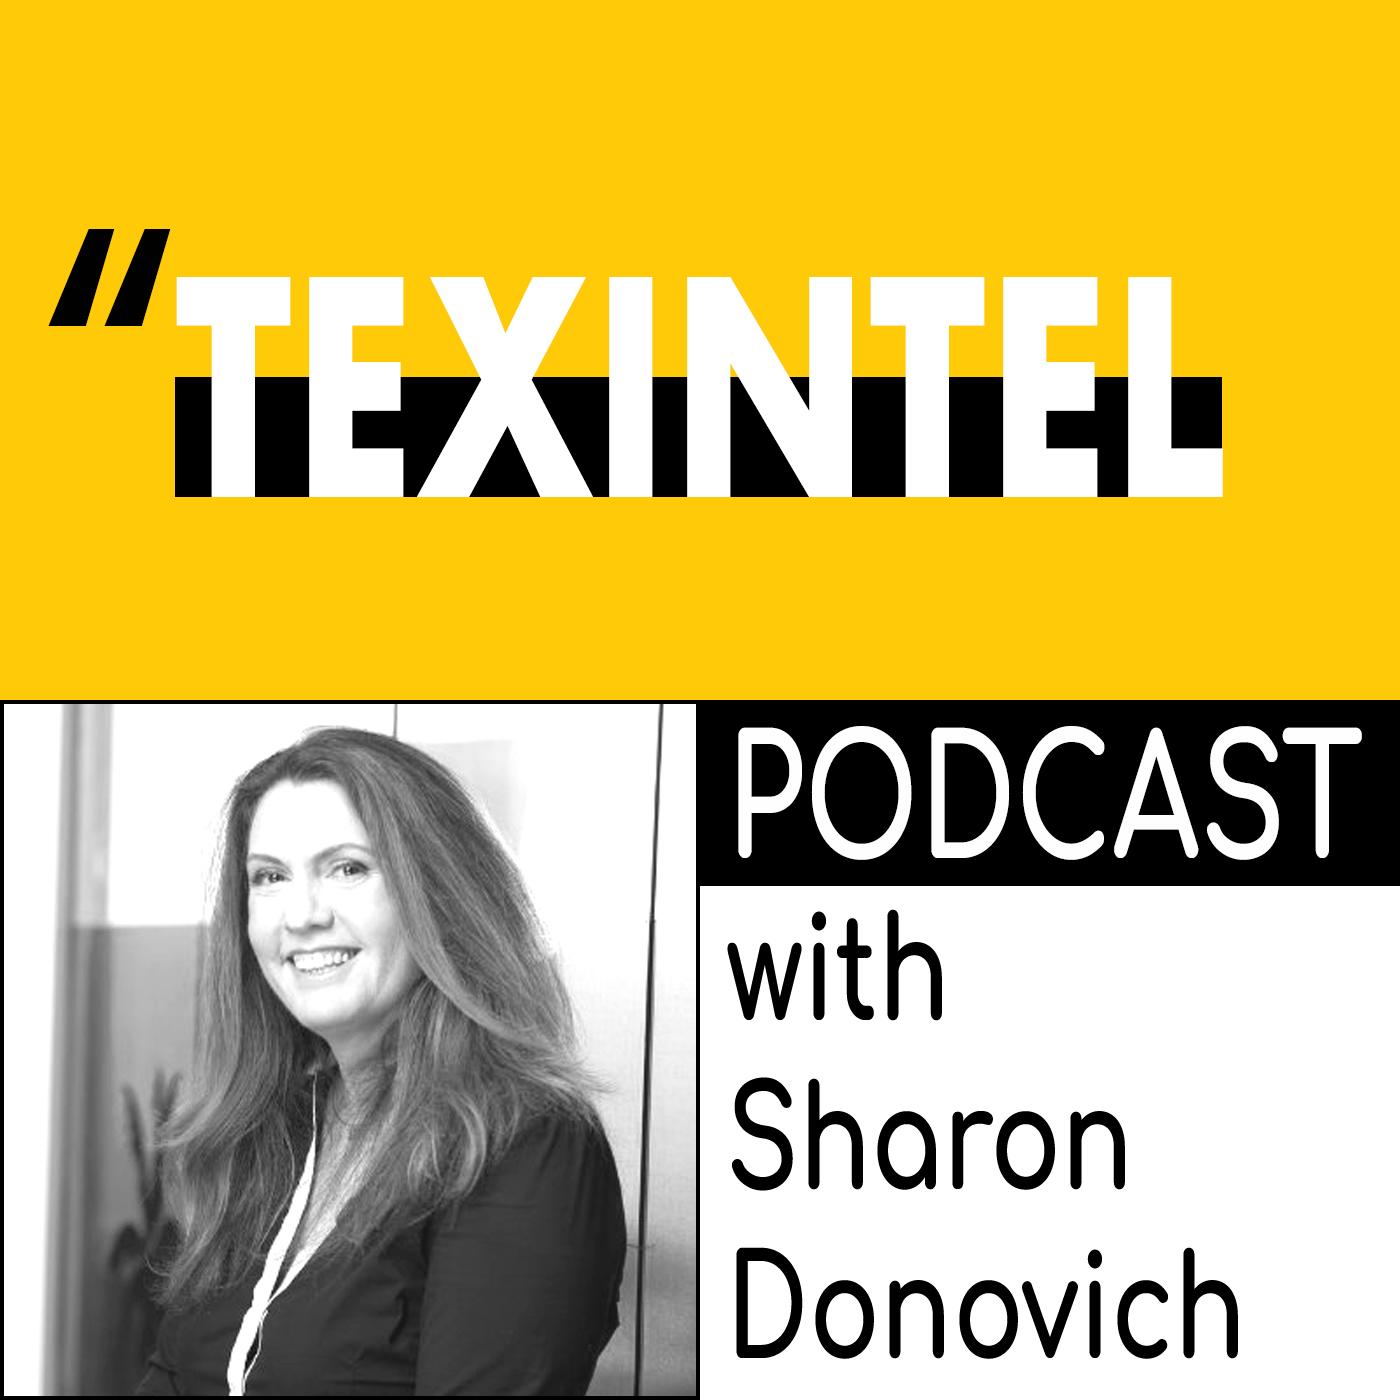 TEXINTEL PODCAST - SHARON DONOVICH.jpg